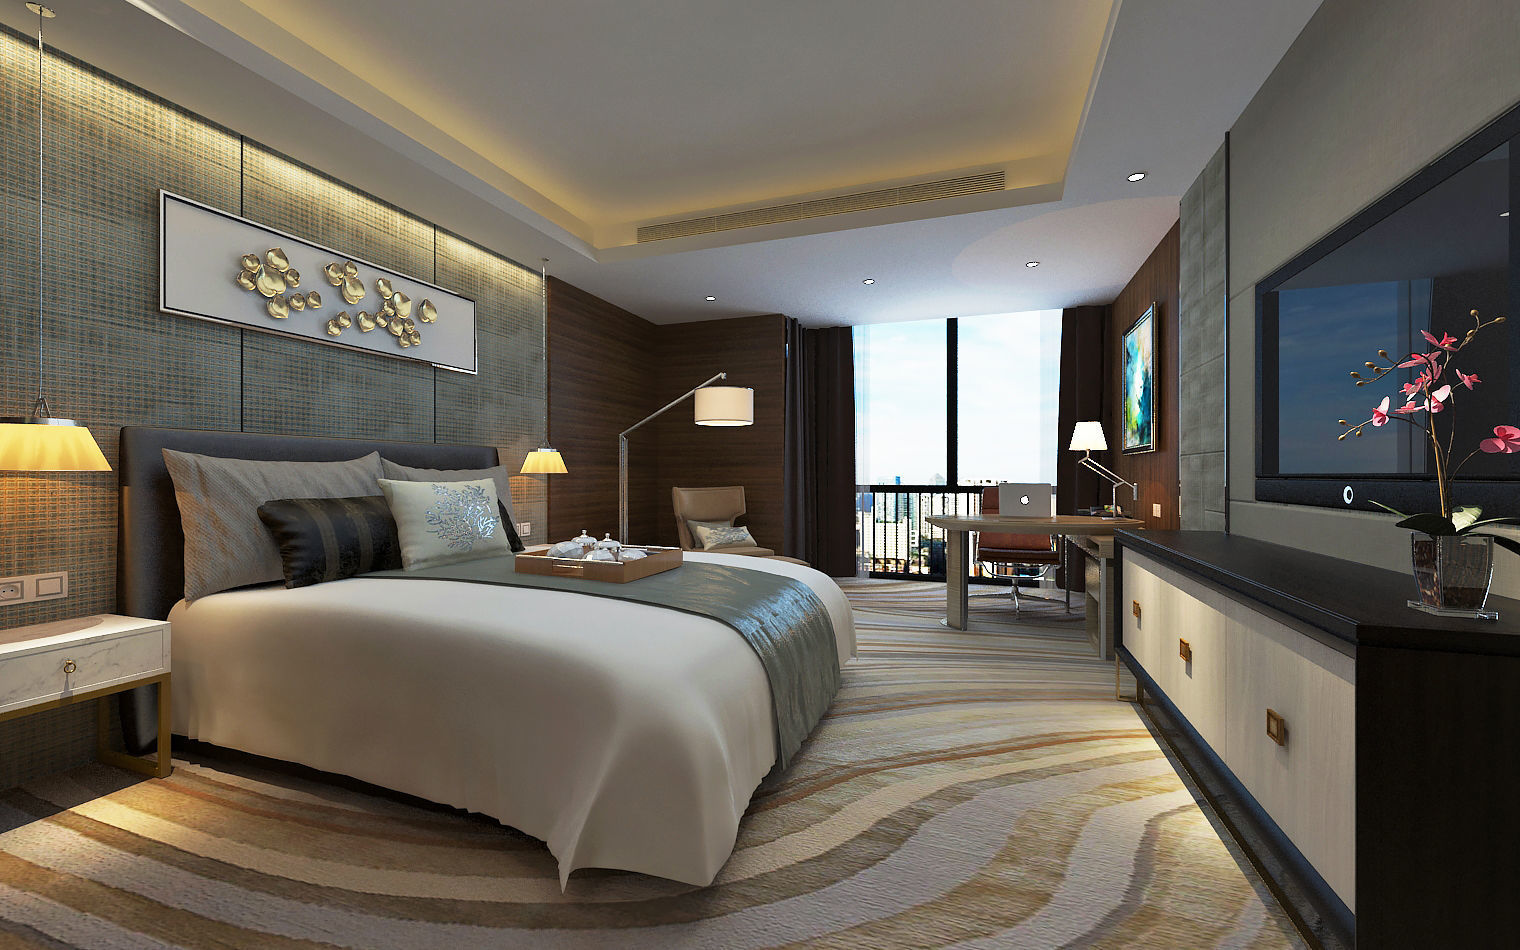 Modern Luxury Hotel Room Design 3D  CGTrader